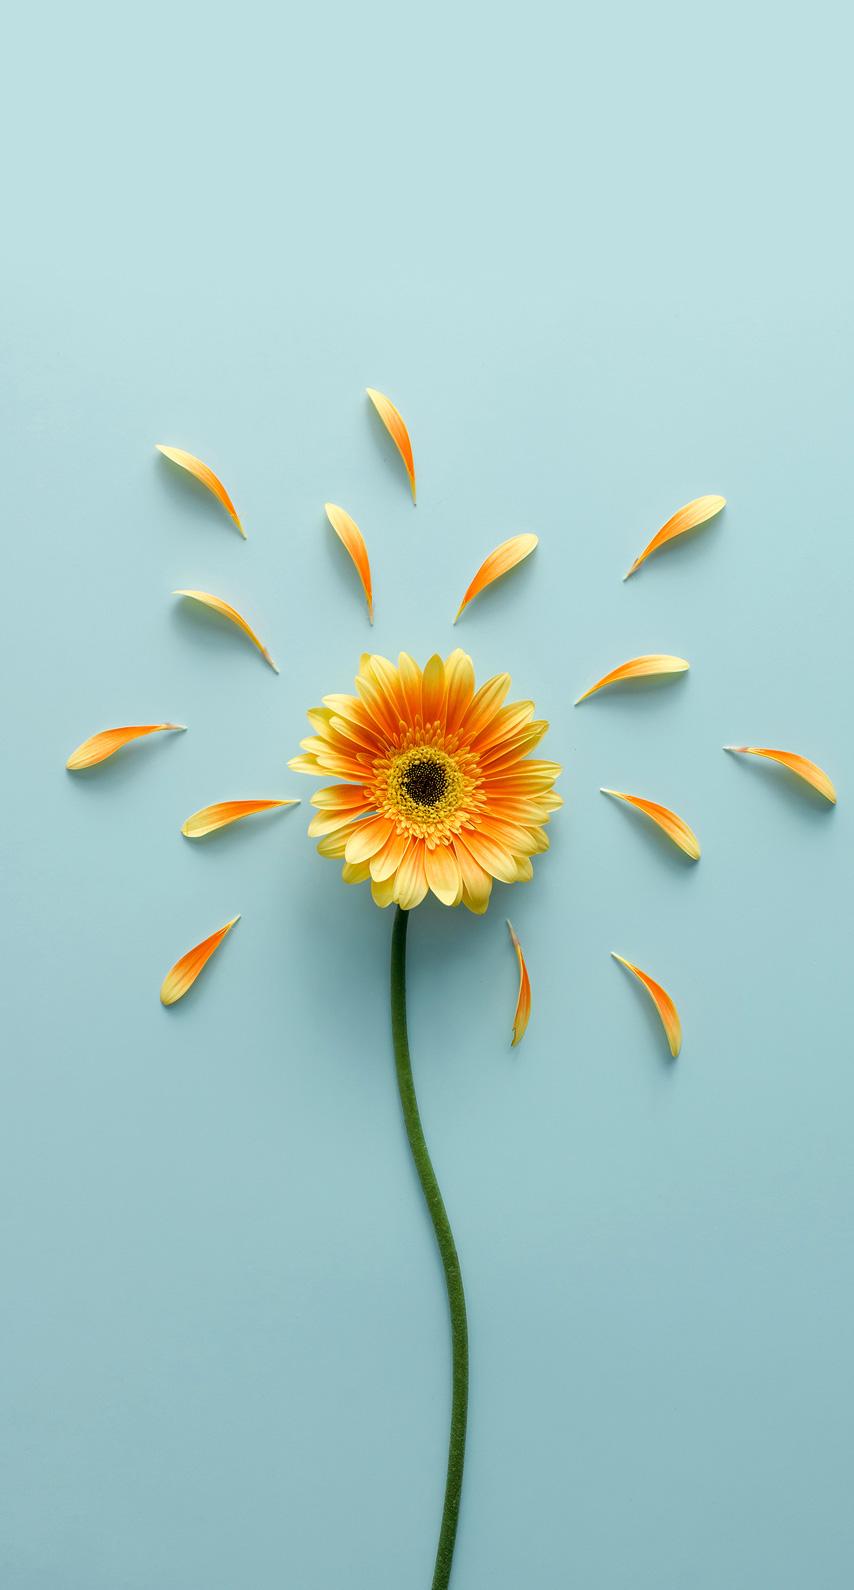 flowering plant, daisy family